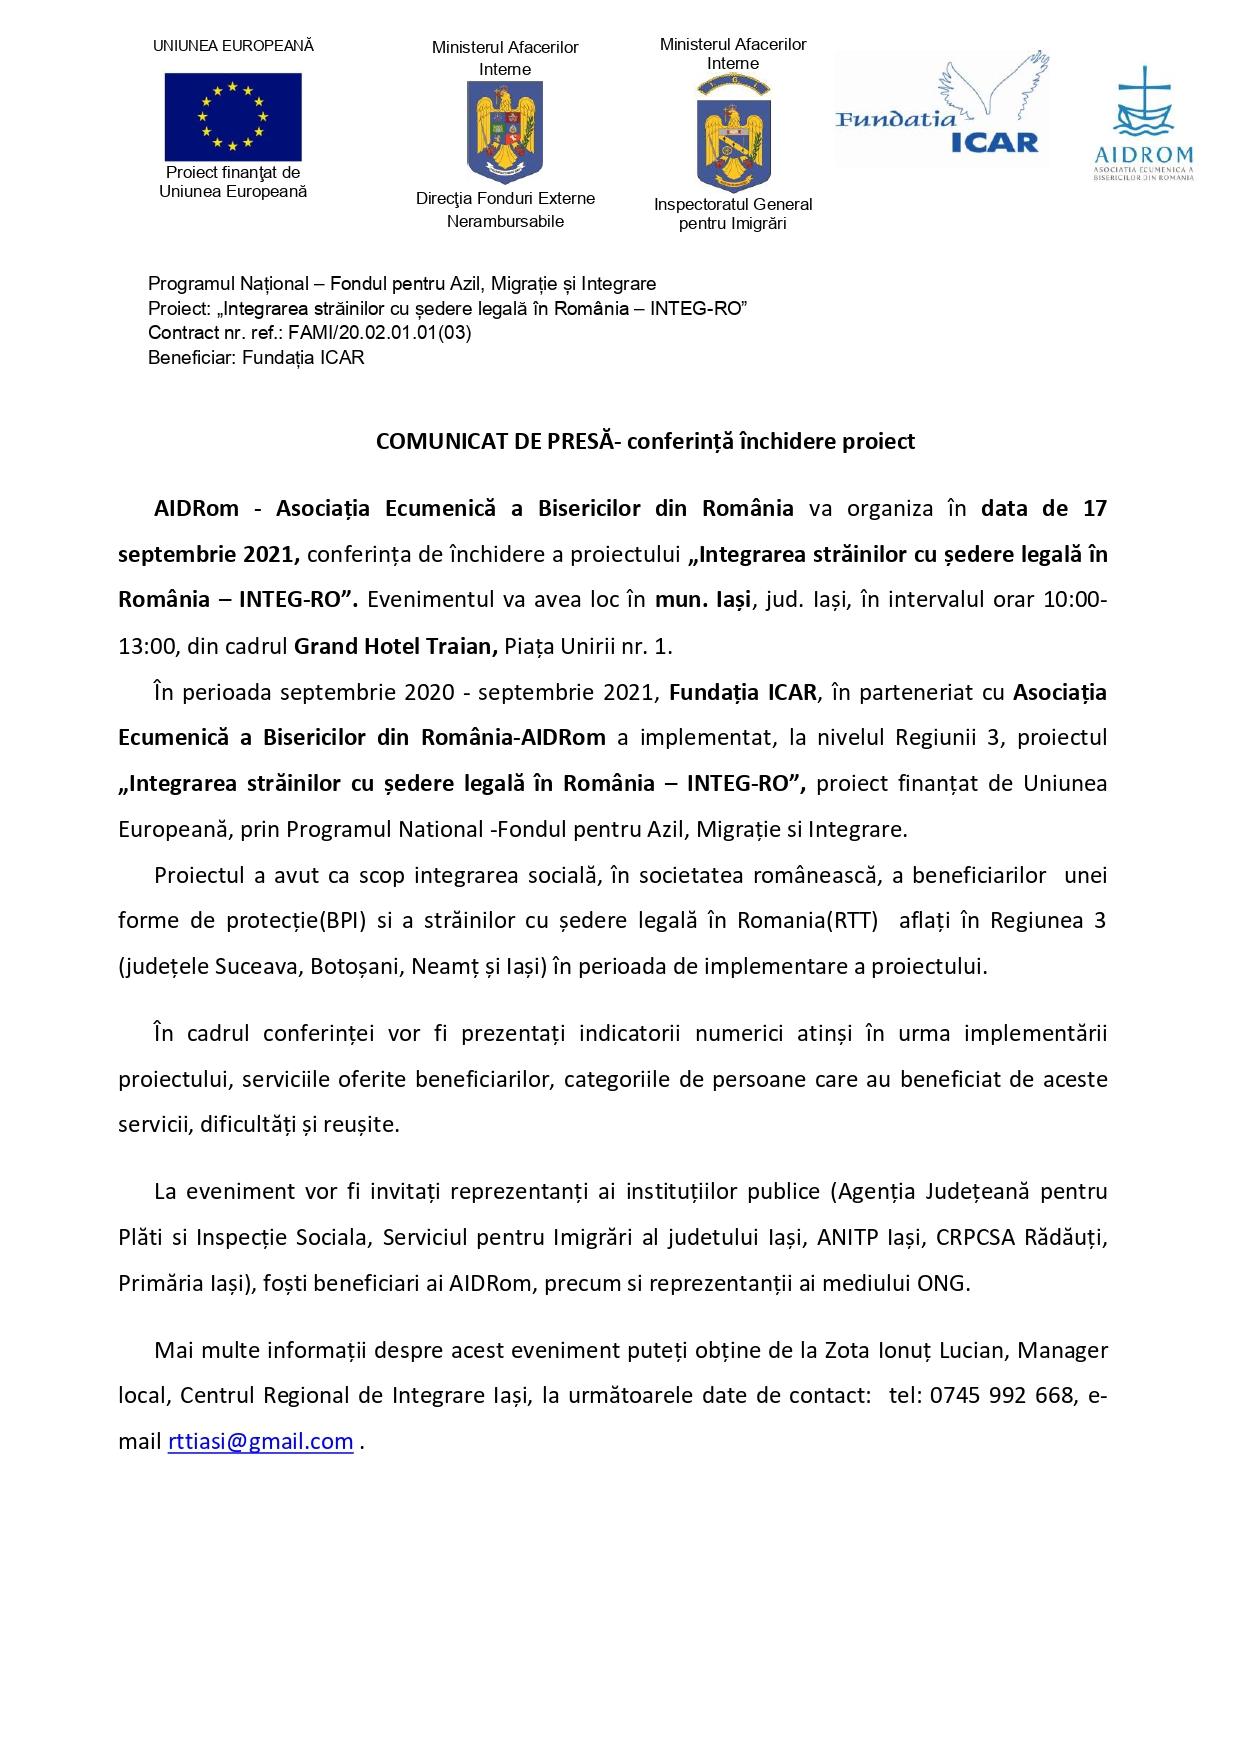 Comunicat de presa conf_finala-IS_page-0001